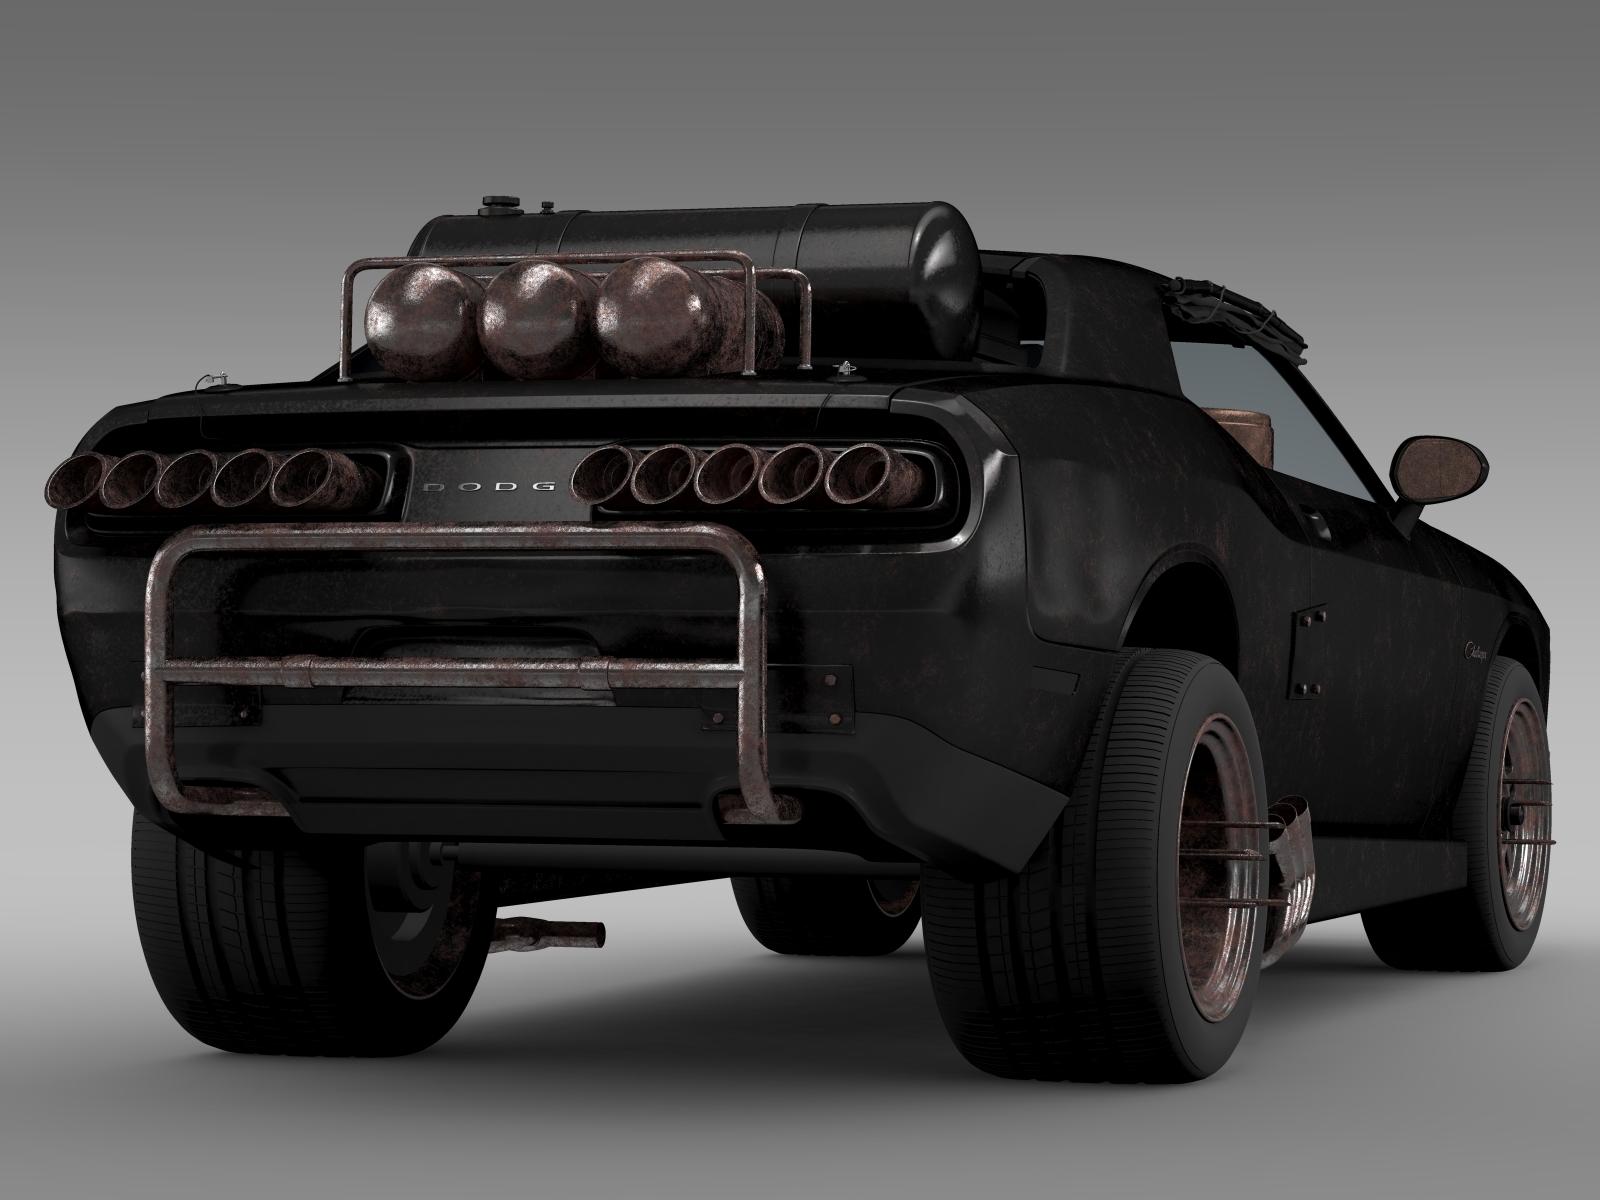 dodge challenger interceptor Mad Max Fight Interceptor Dodge Challenger 2015 3D Model